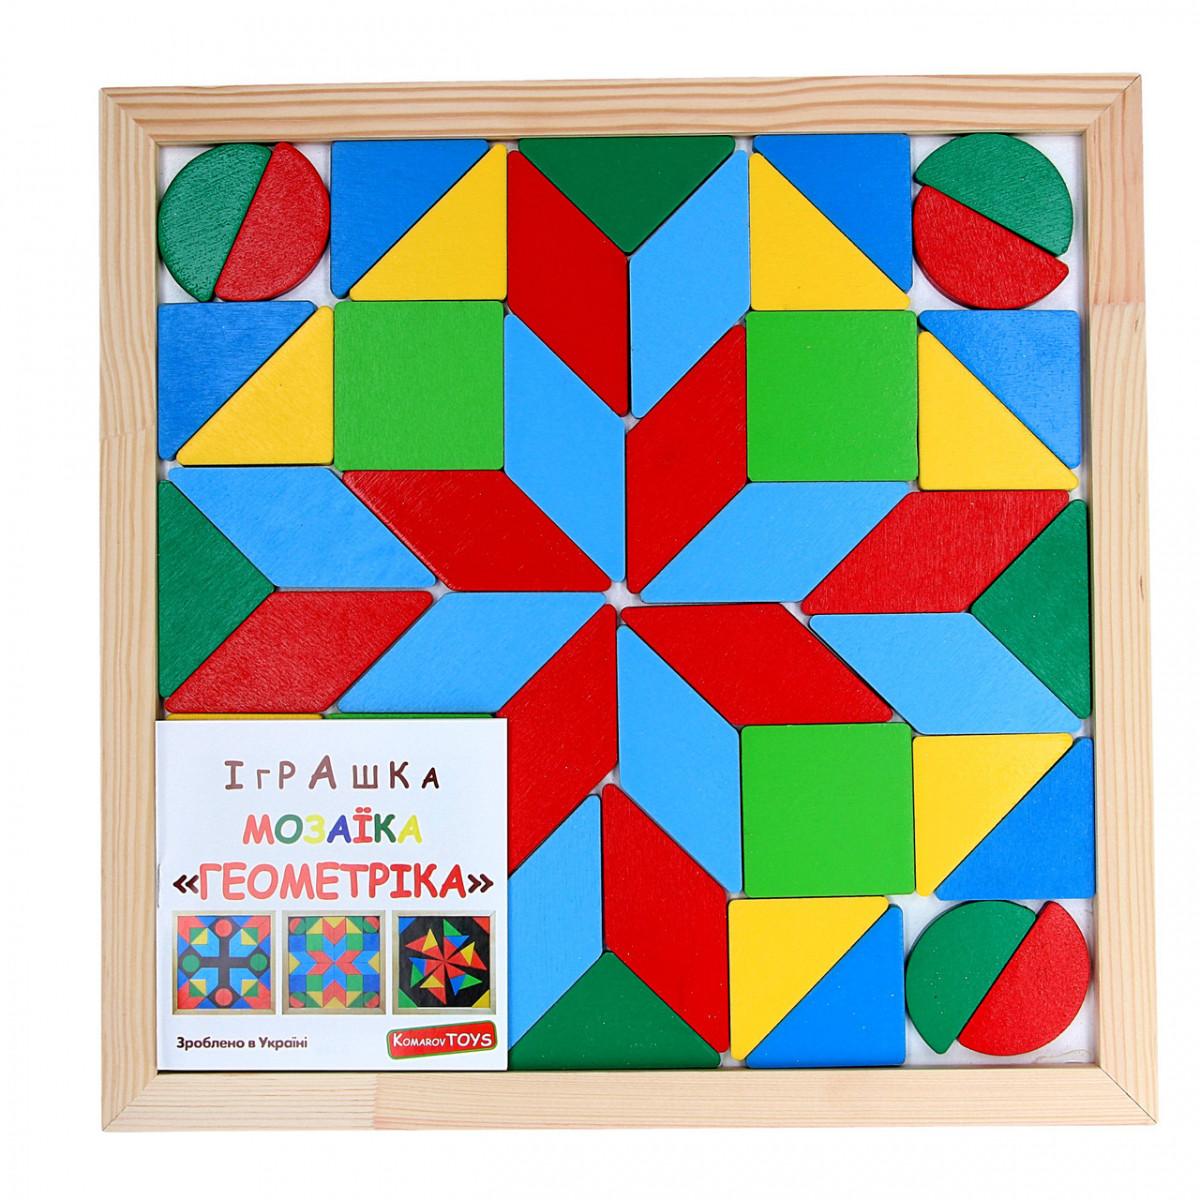 Детская деревянная мозаика Геометрика 4 фигуры, Komarovtoys (А 346)